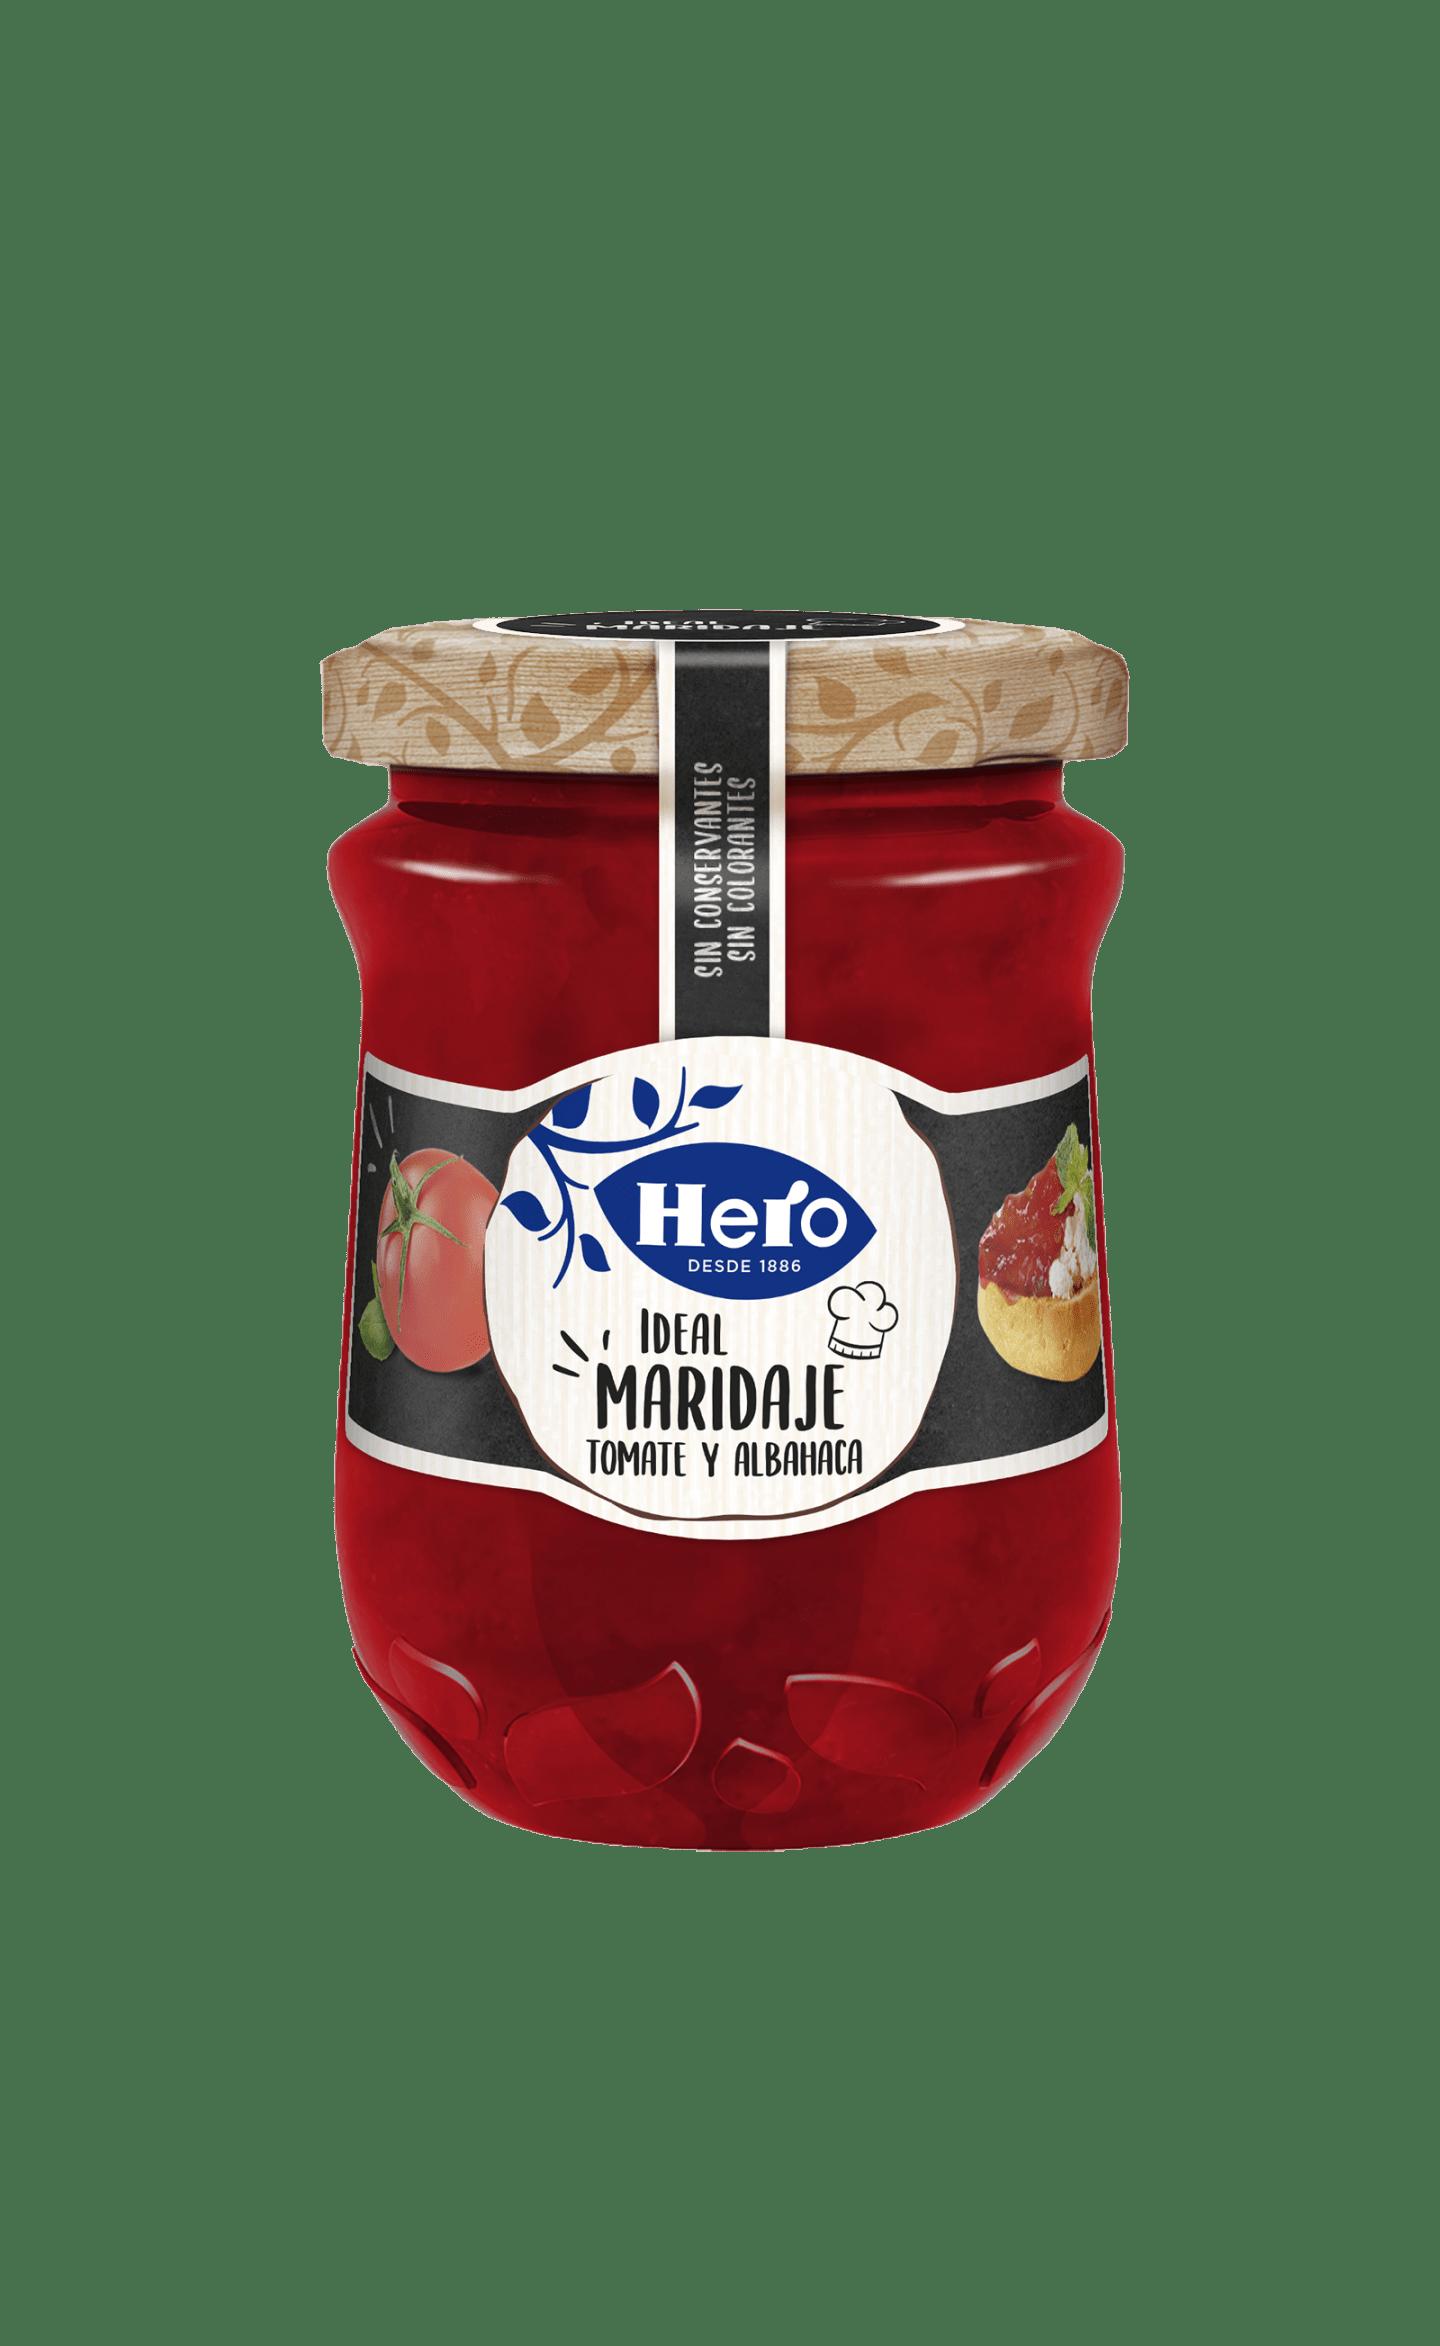 Maridaje Tomate y Albahaca